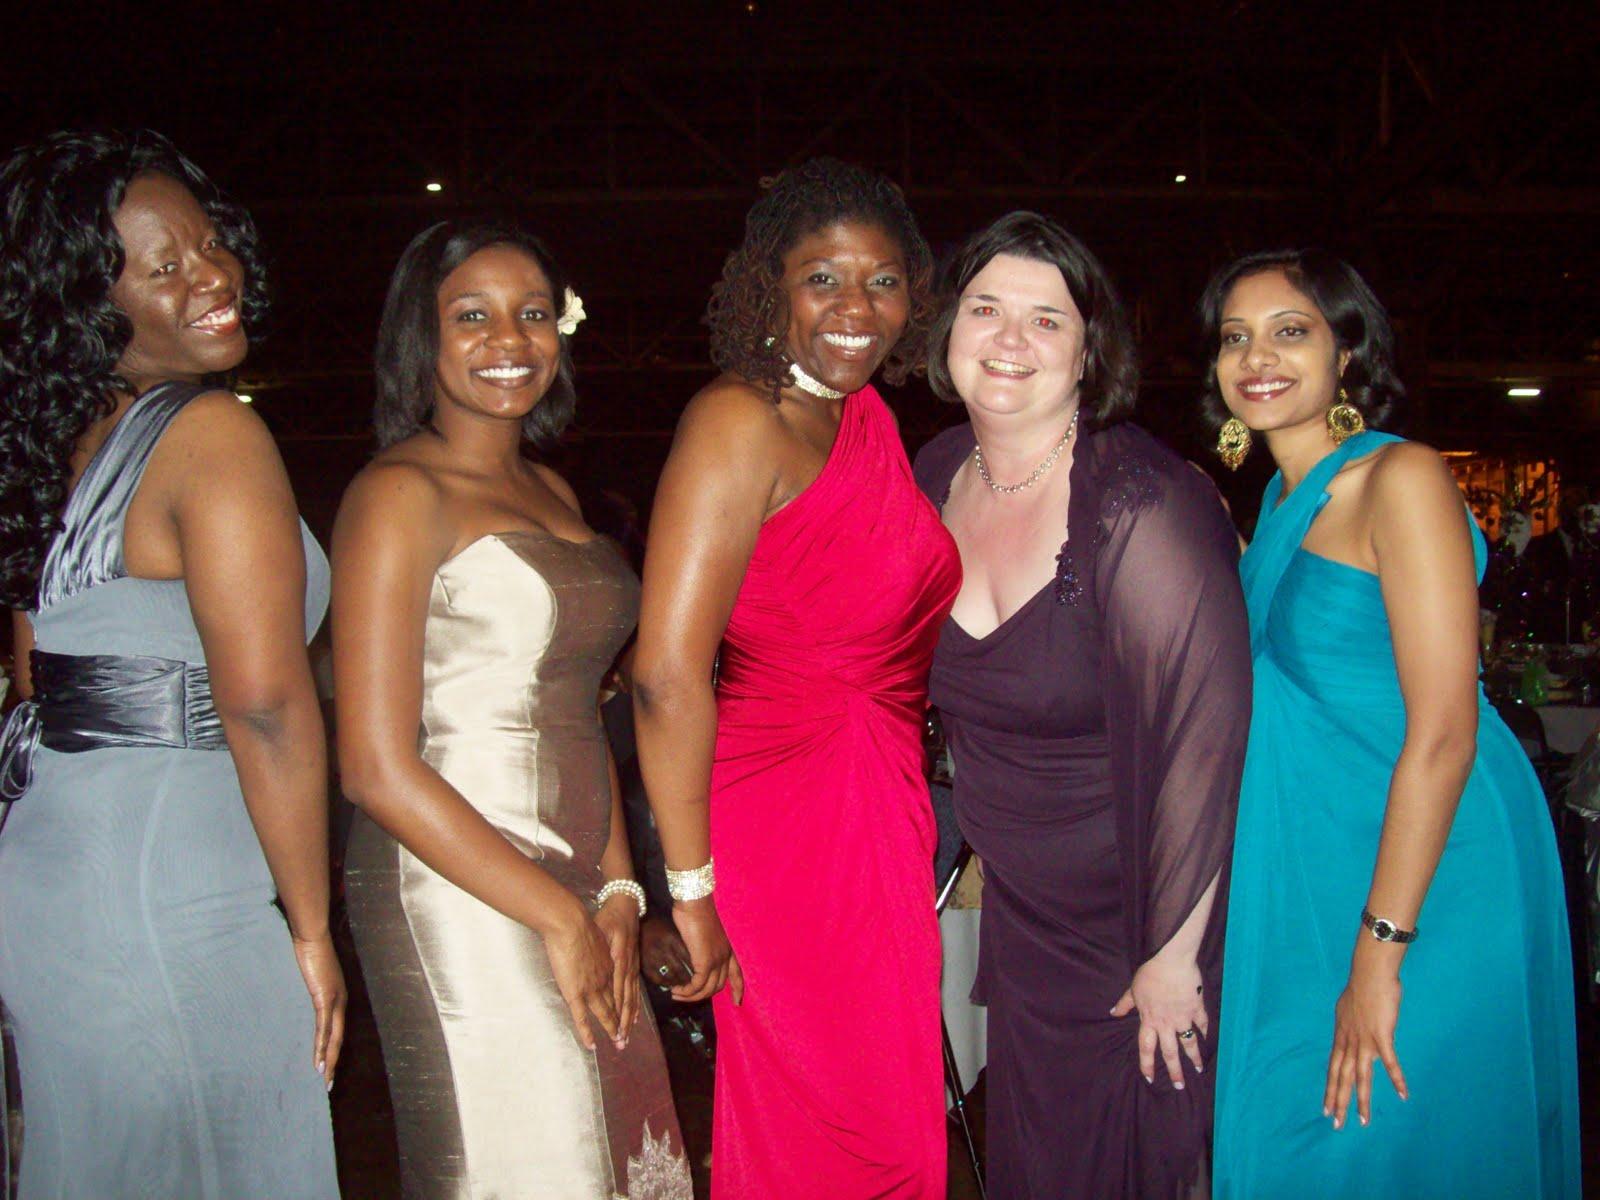 NORA in NOLA: The 2011 Zulu Coronation Ball